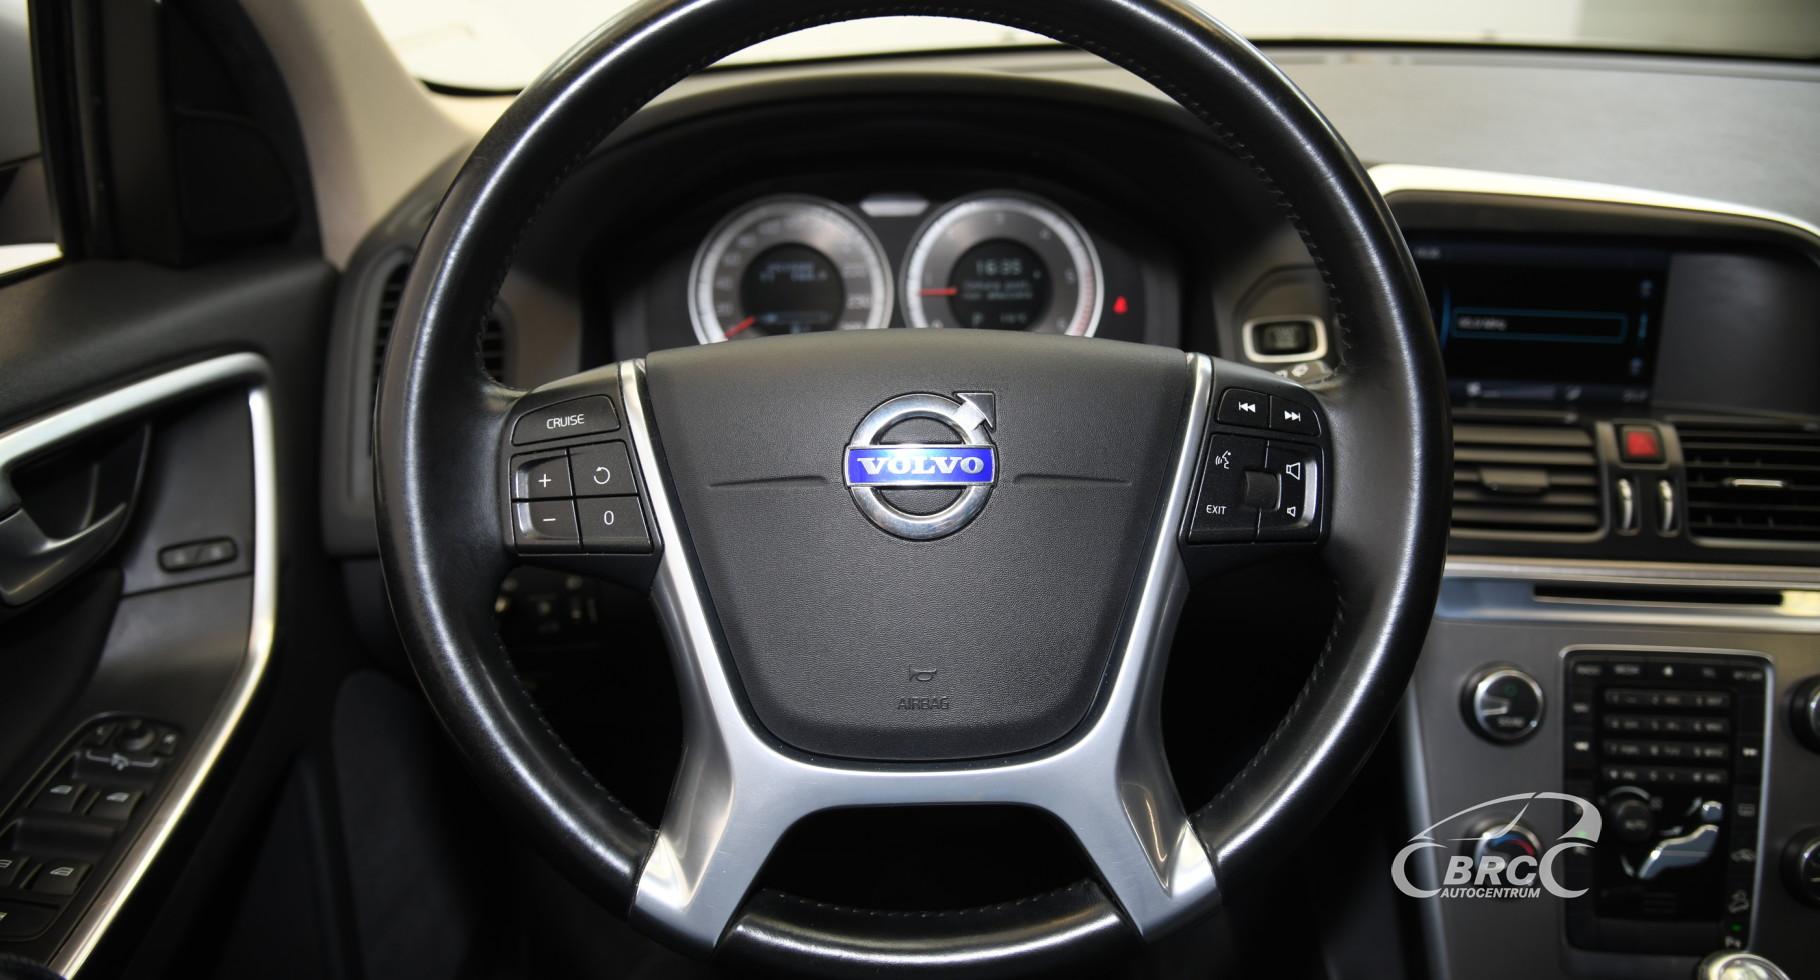 Volvo XC 60 2.4 D4 AWD Automatas